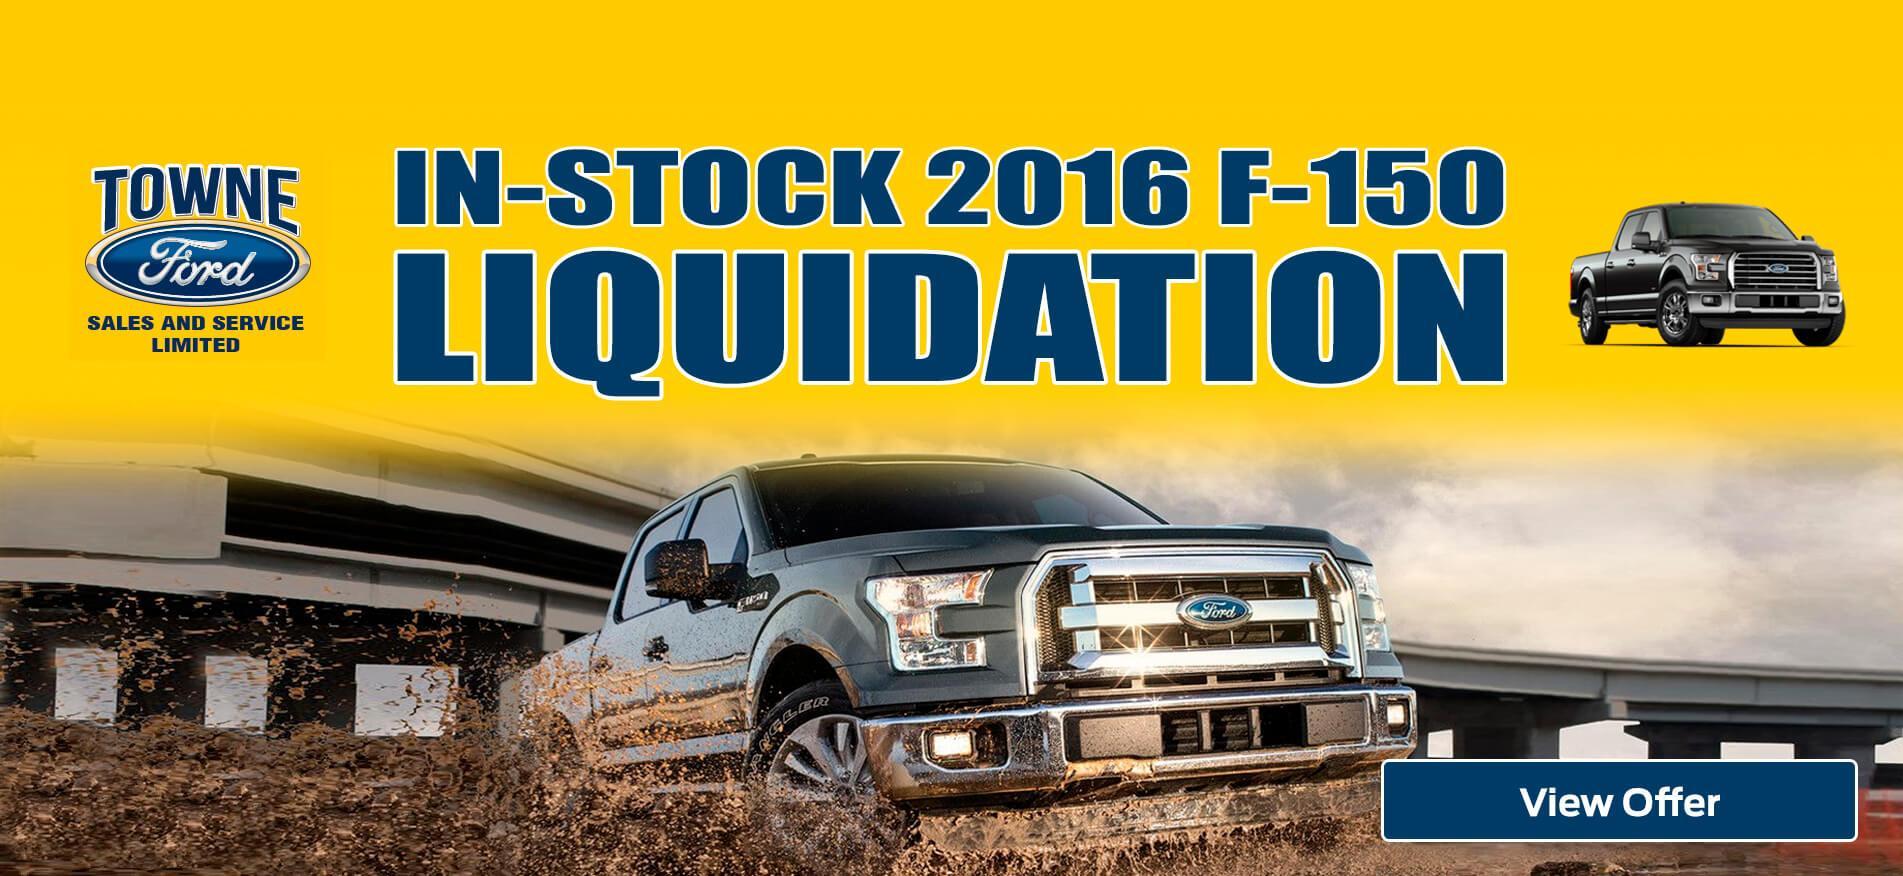 F-150 liquidation Towne Sales Ford